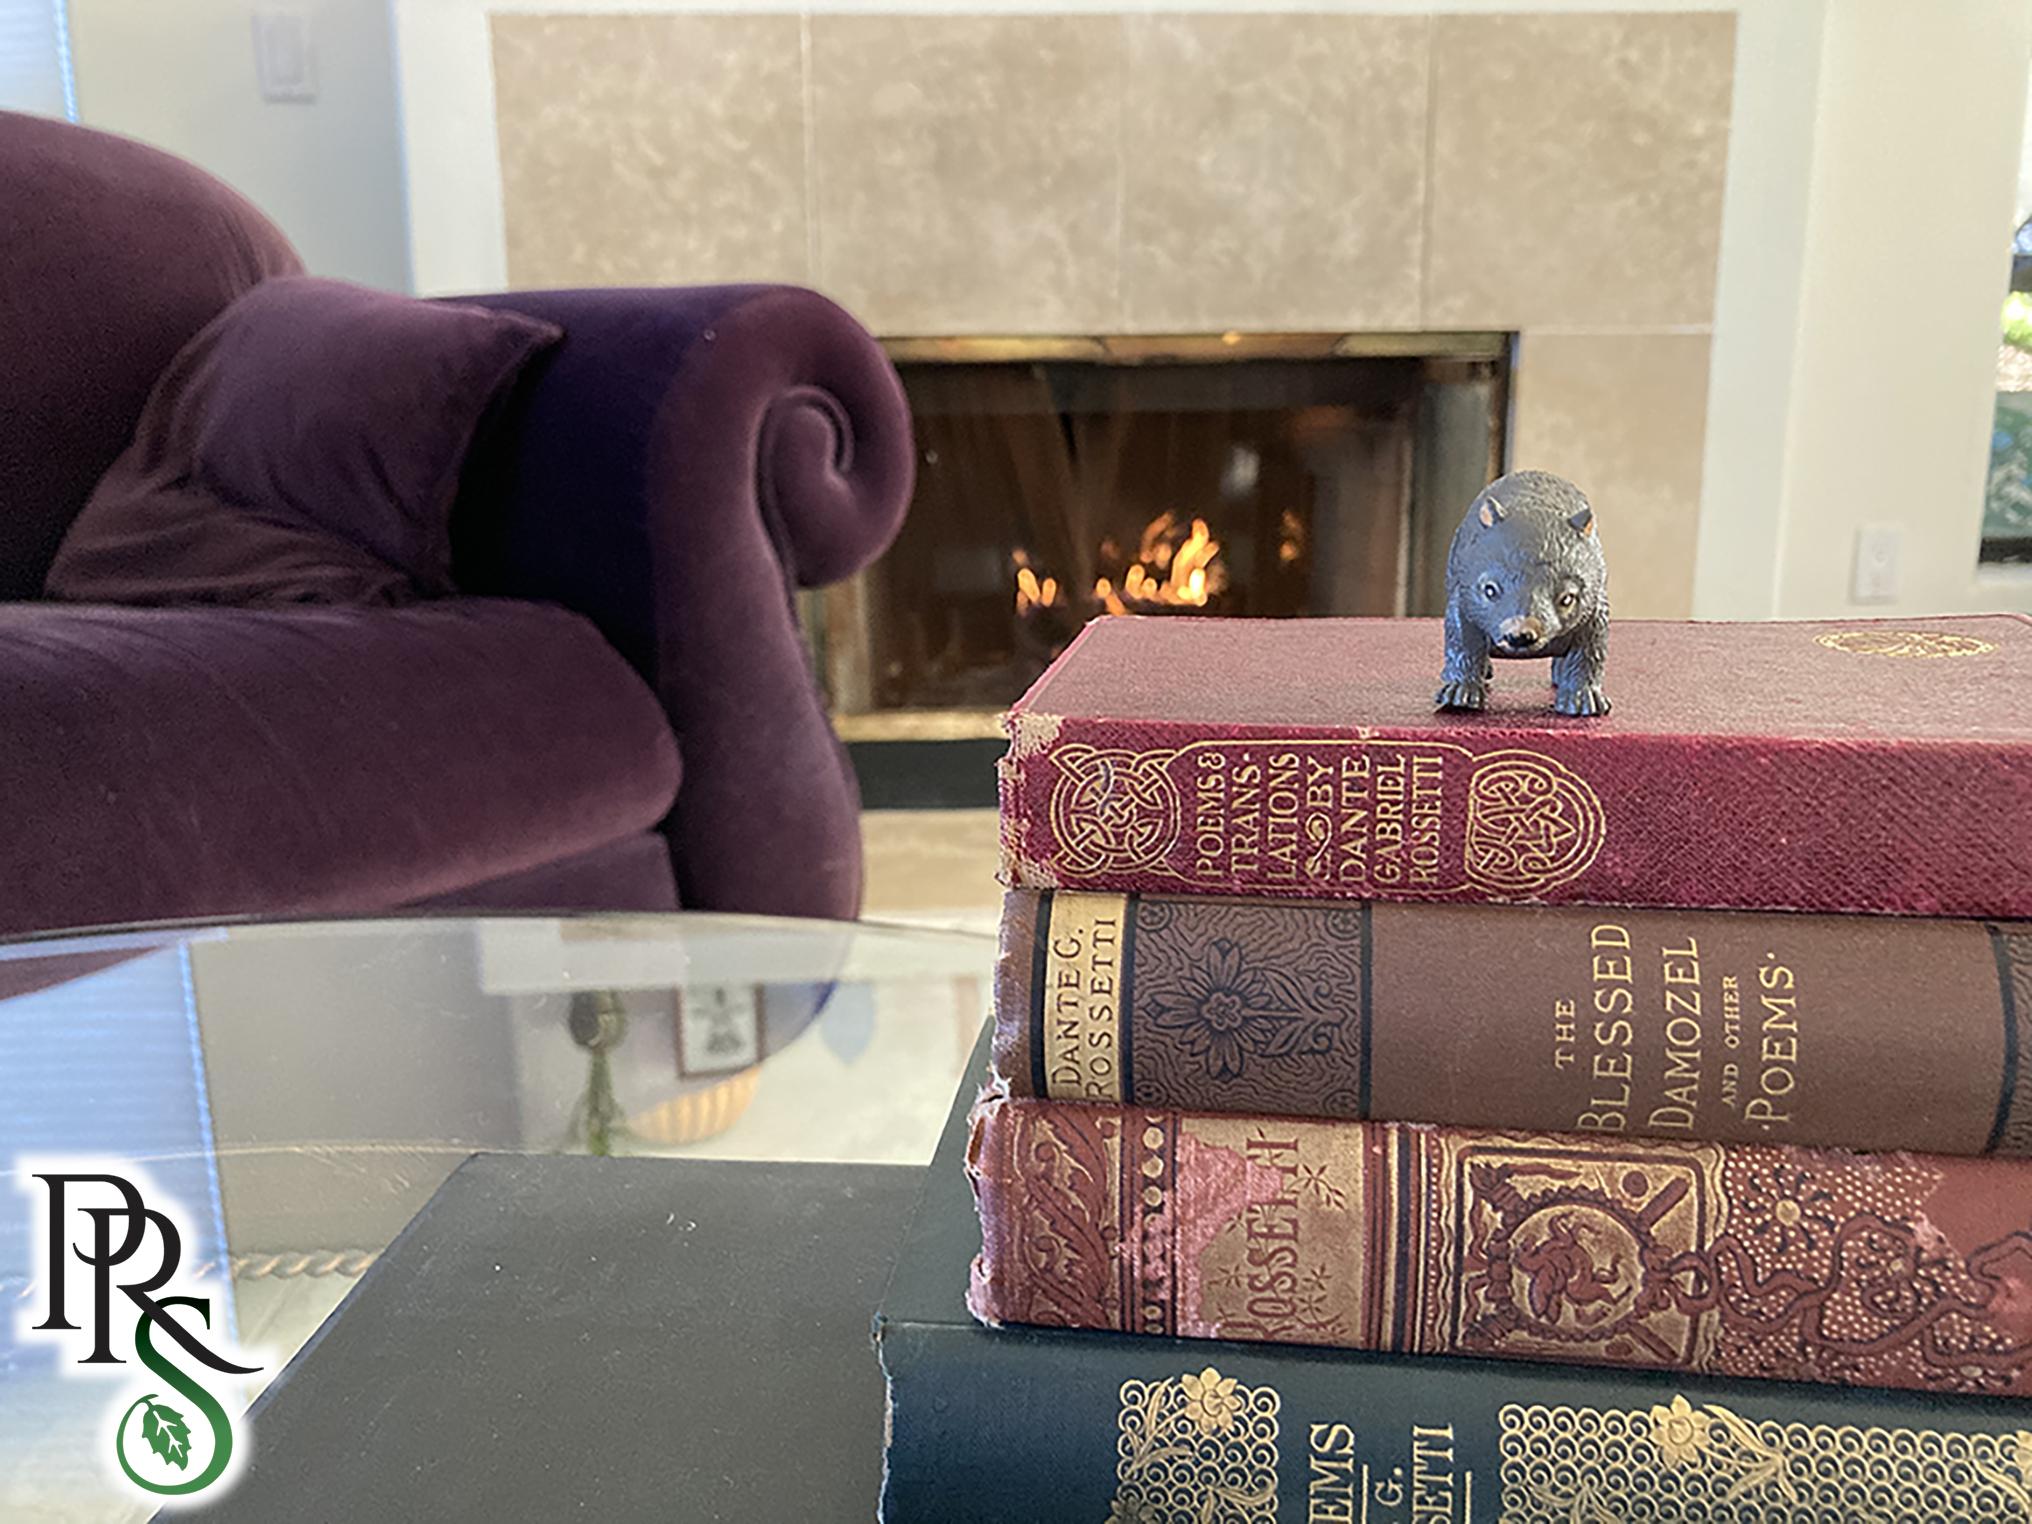 Pre-Raphaelite Sisterhood wombat with books